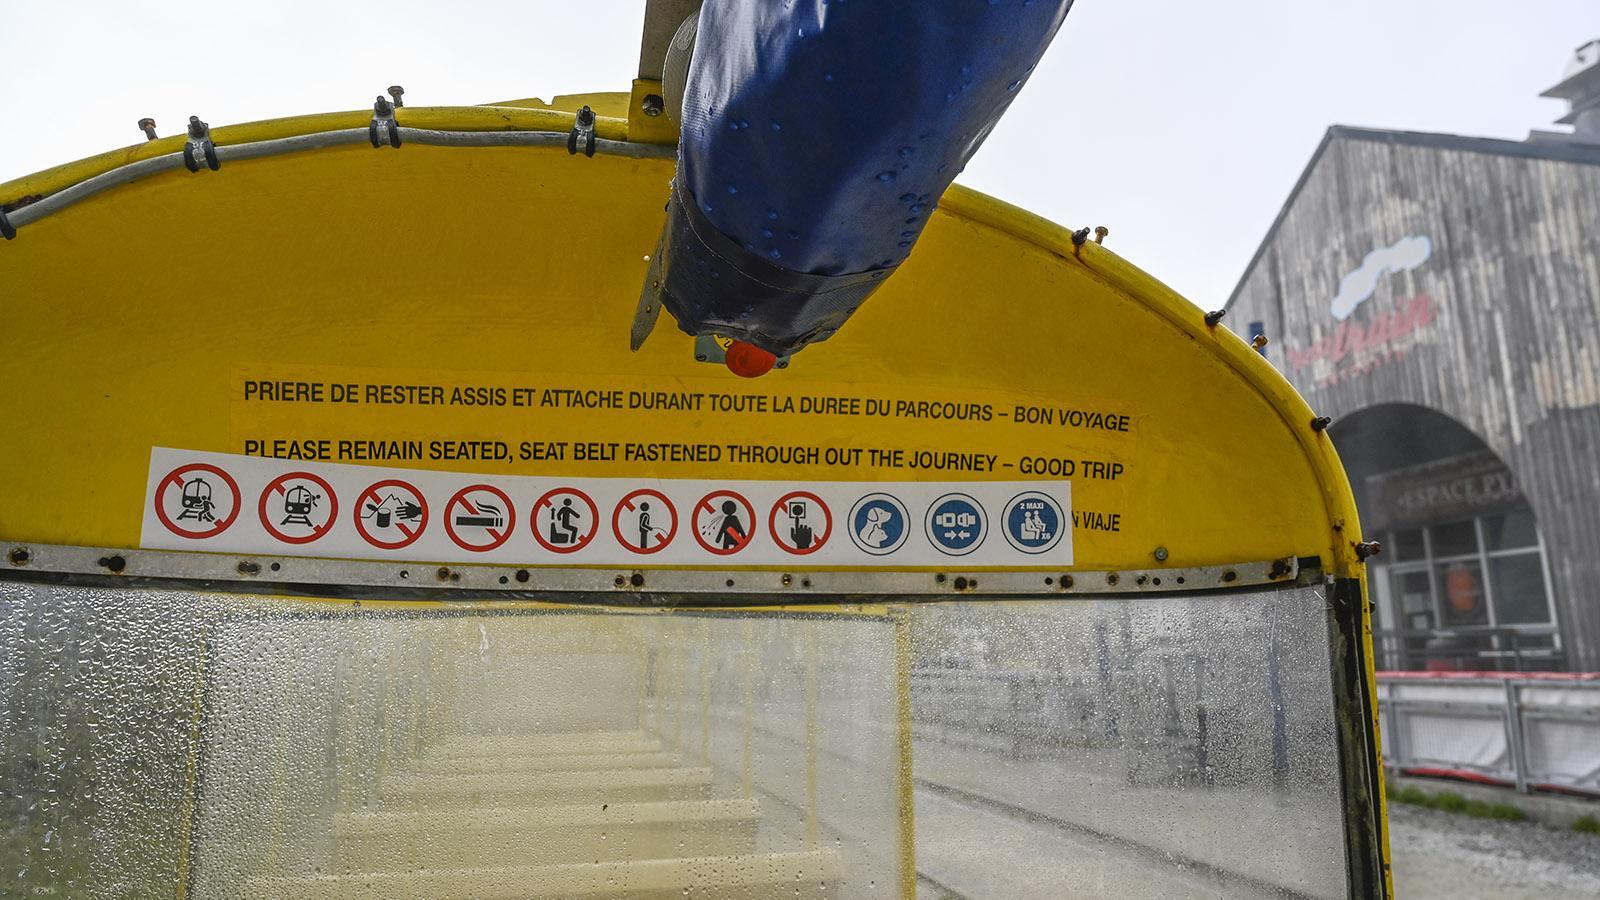 Le Petit Train d'Artouste: Bei Regen wird das Verdeck heruntergerollt. Foto: Hilke Maunder